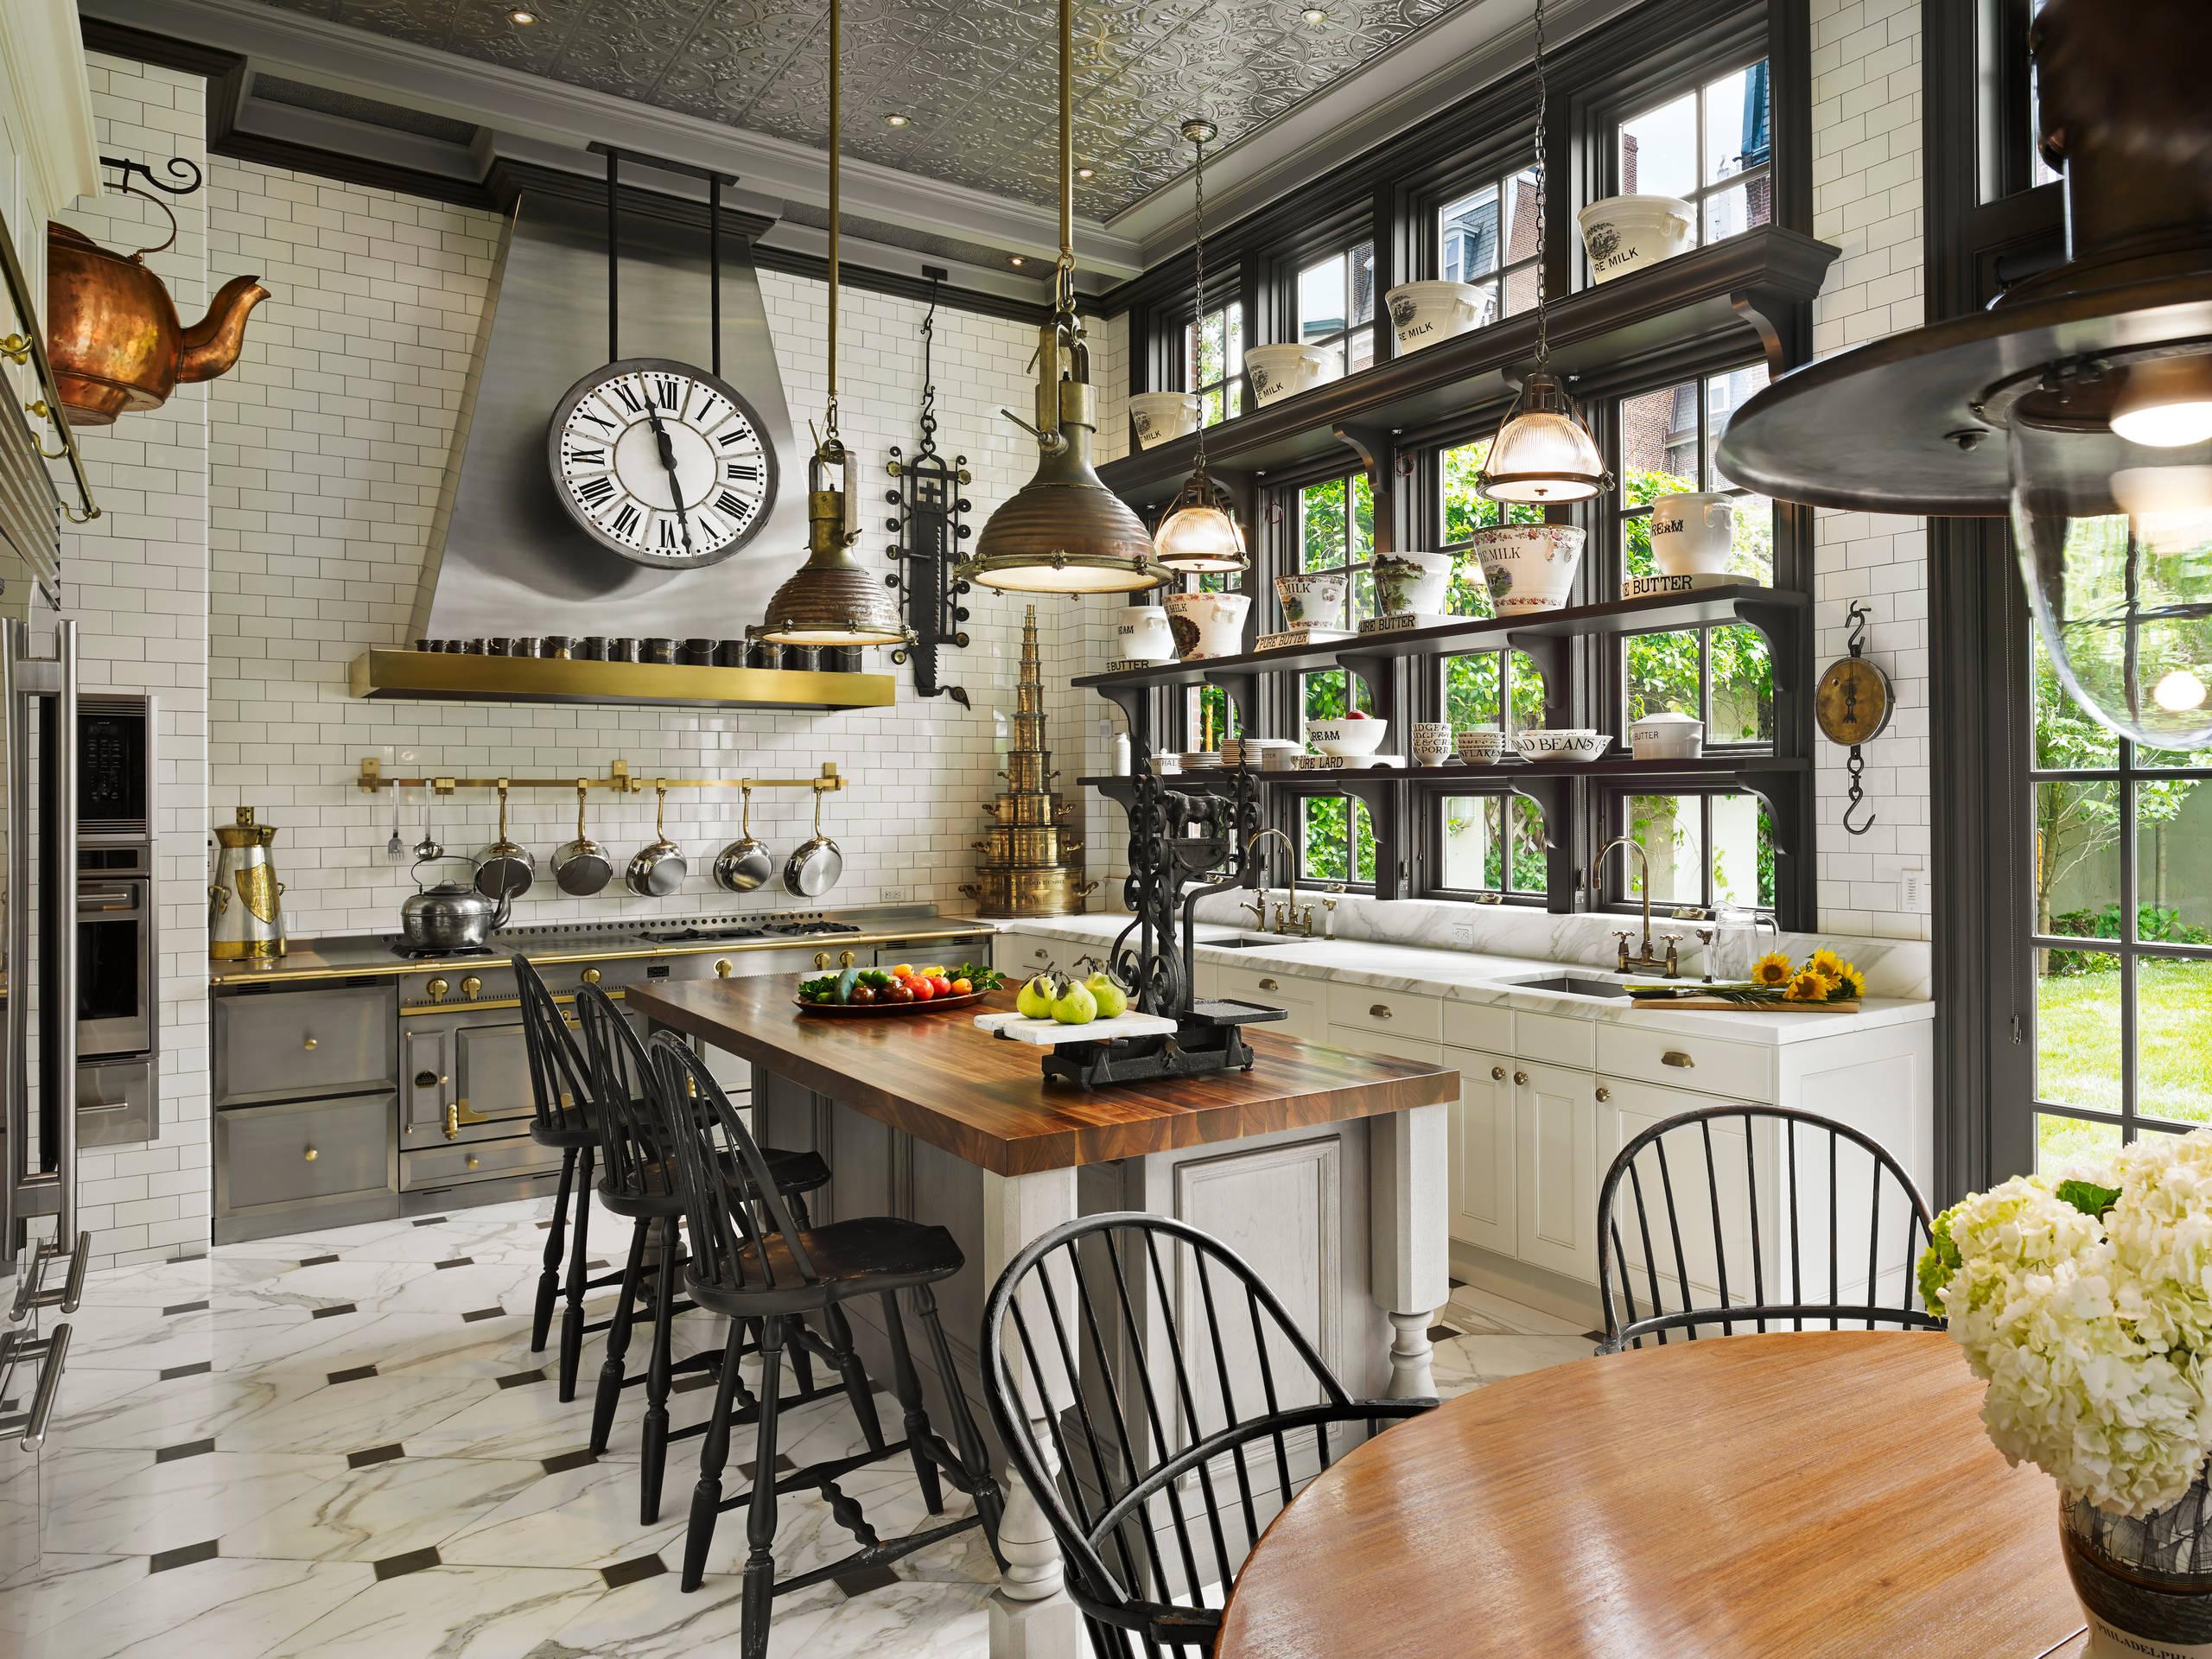 9 Beautiful Victorian Kitchen Pictures & Ideas   June, 9   Houzz